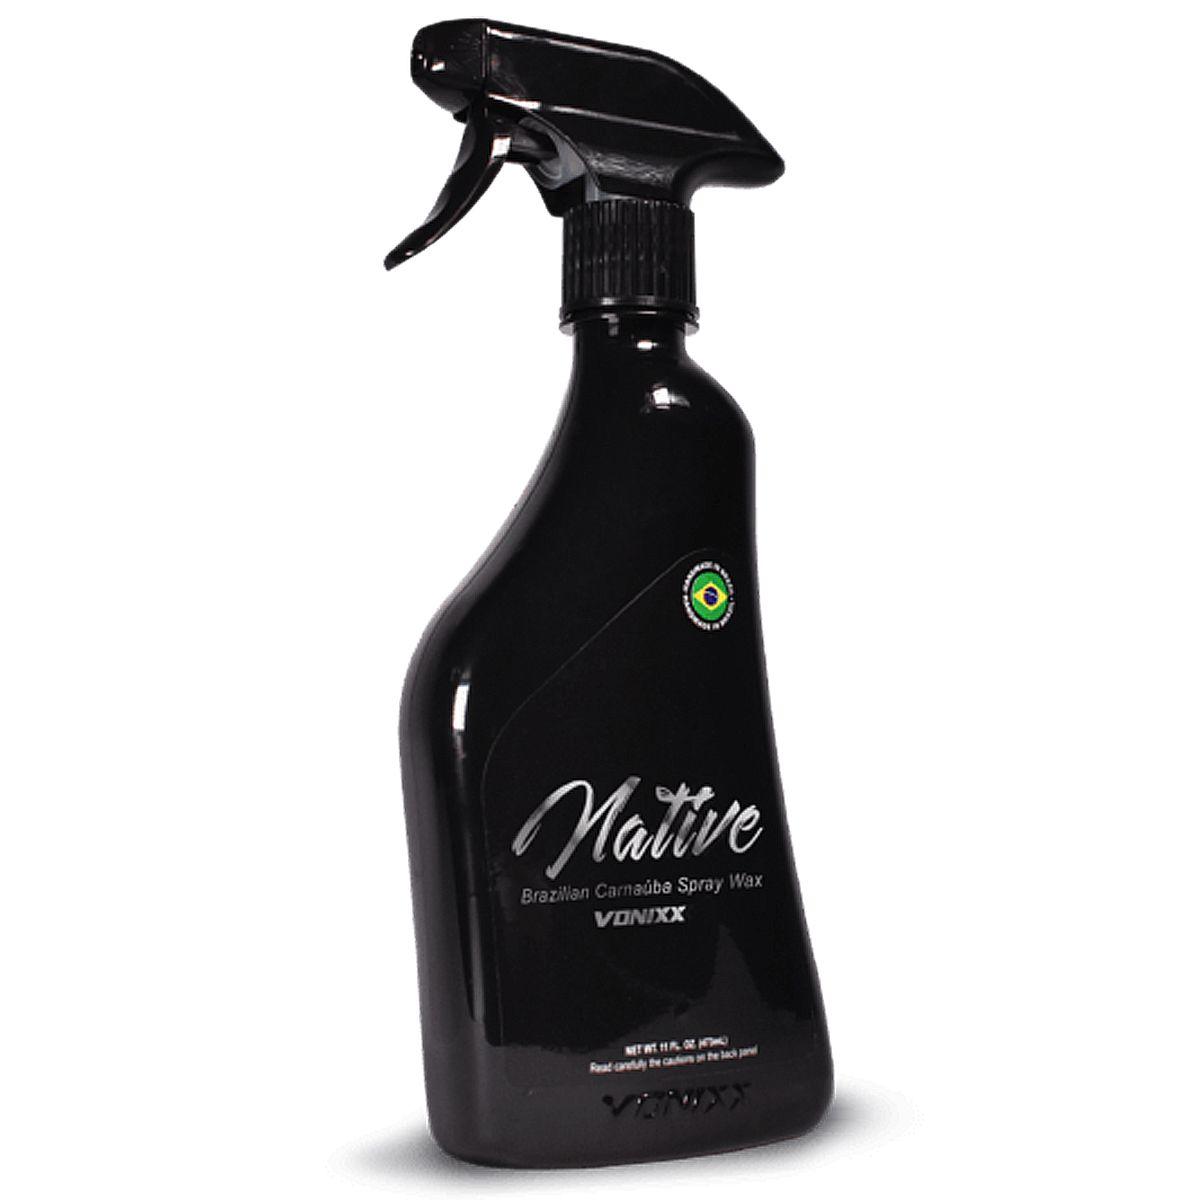 Cera Native Brazilian Spray+ Tok Final 500ml Vonixx